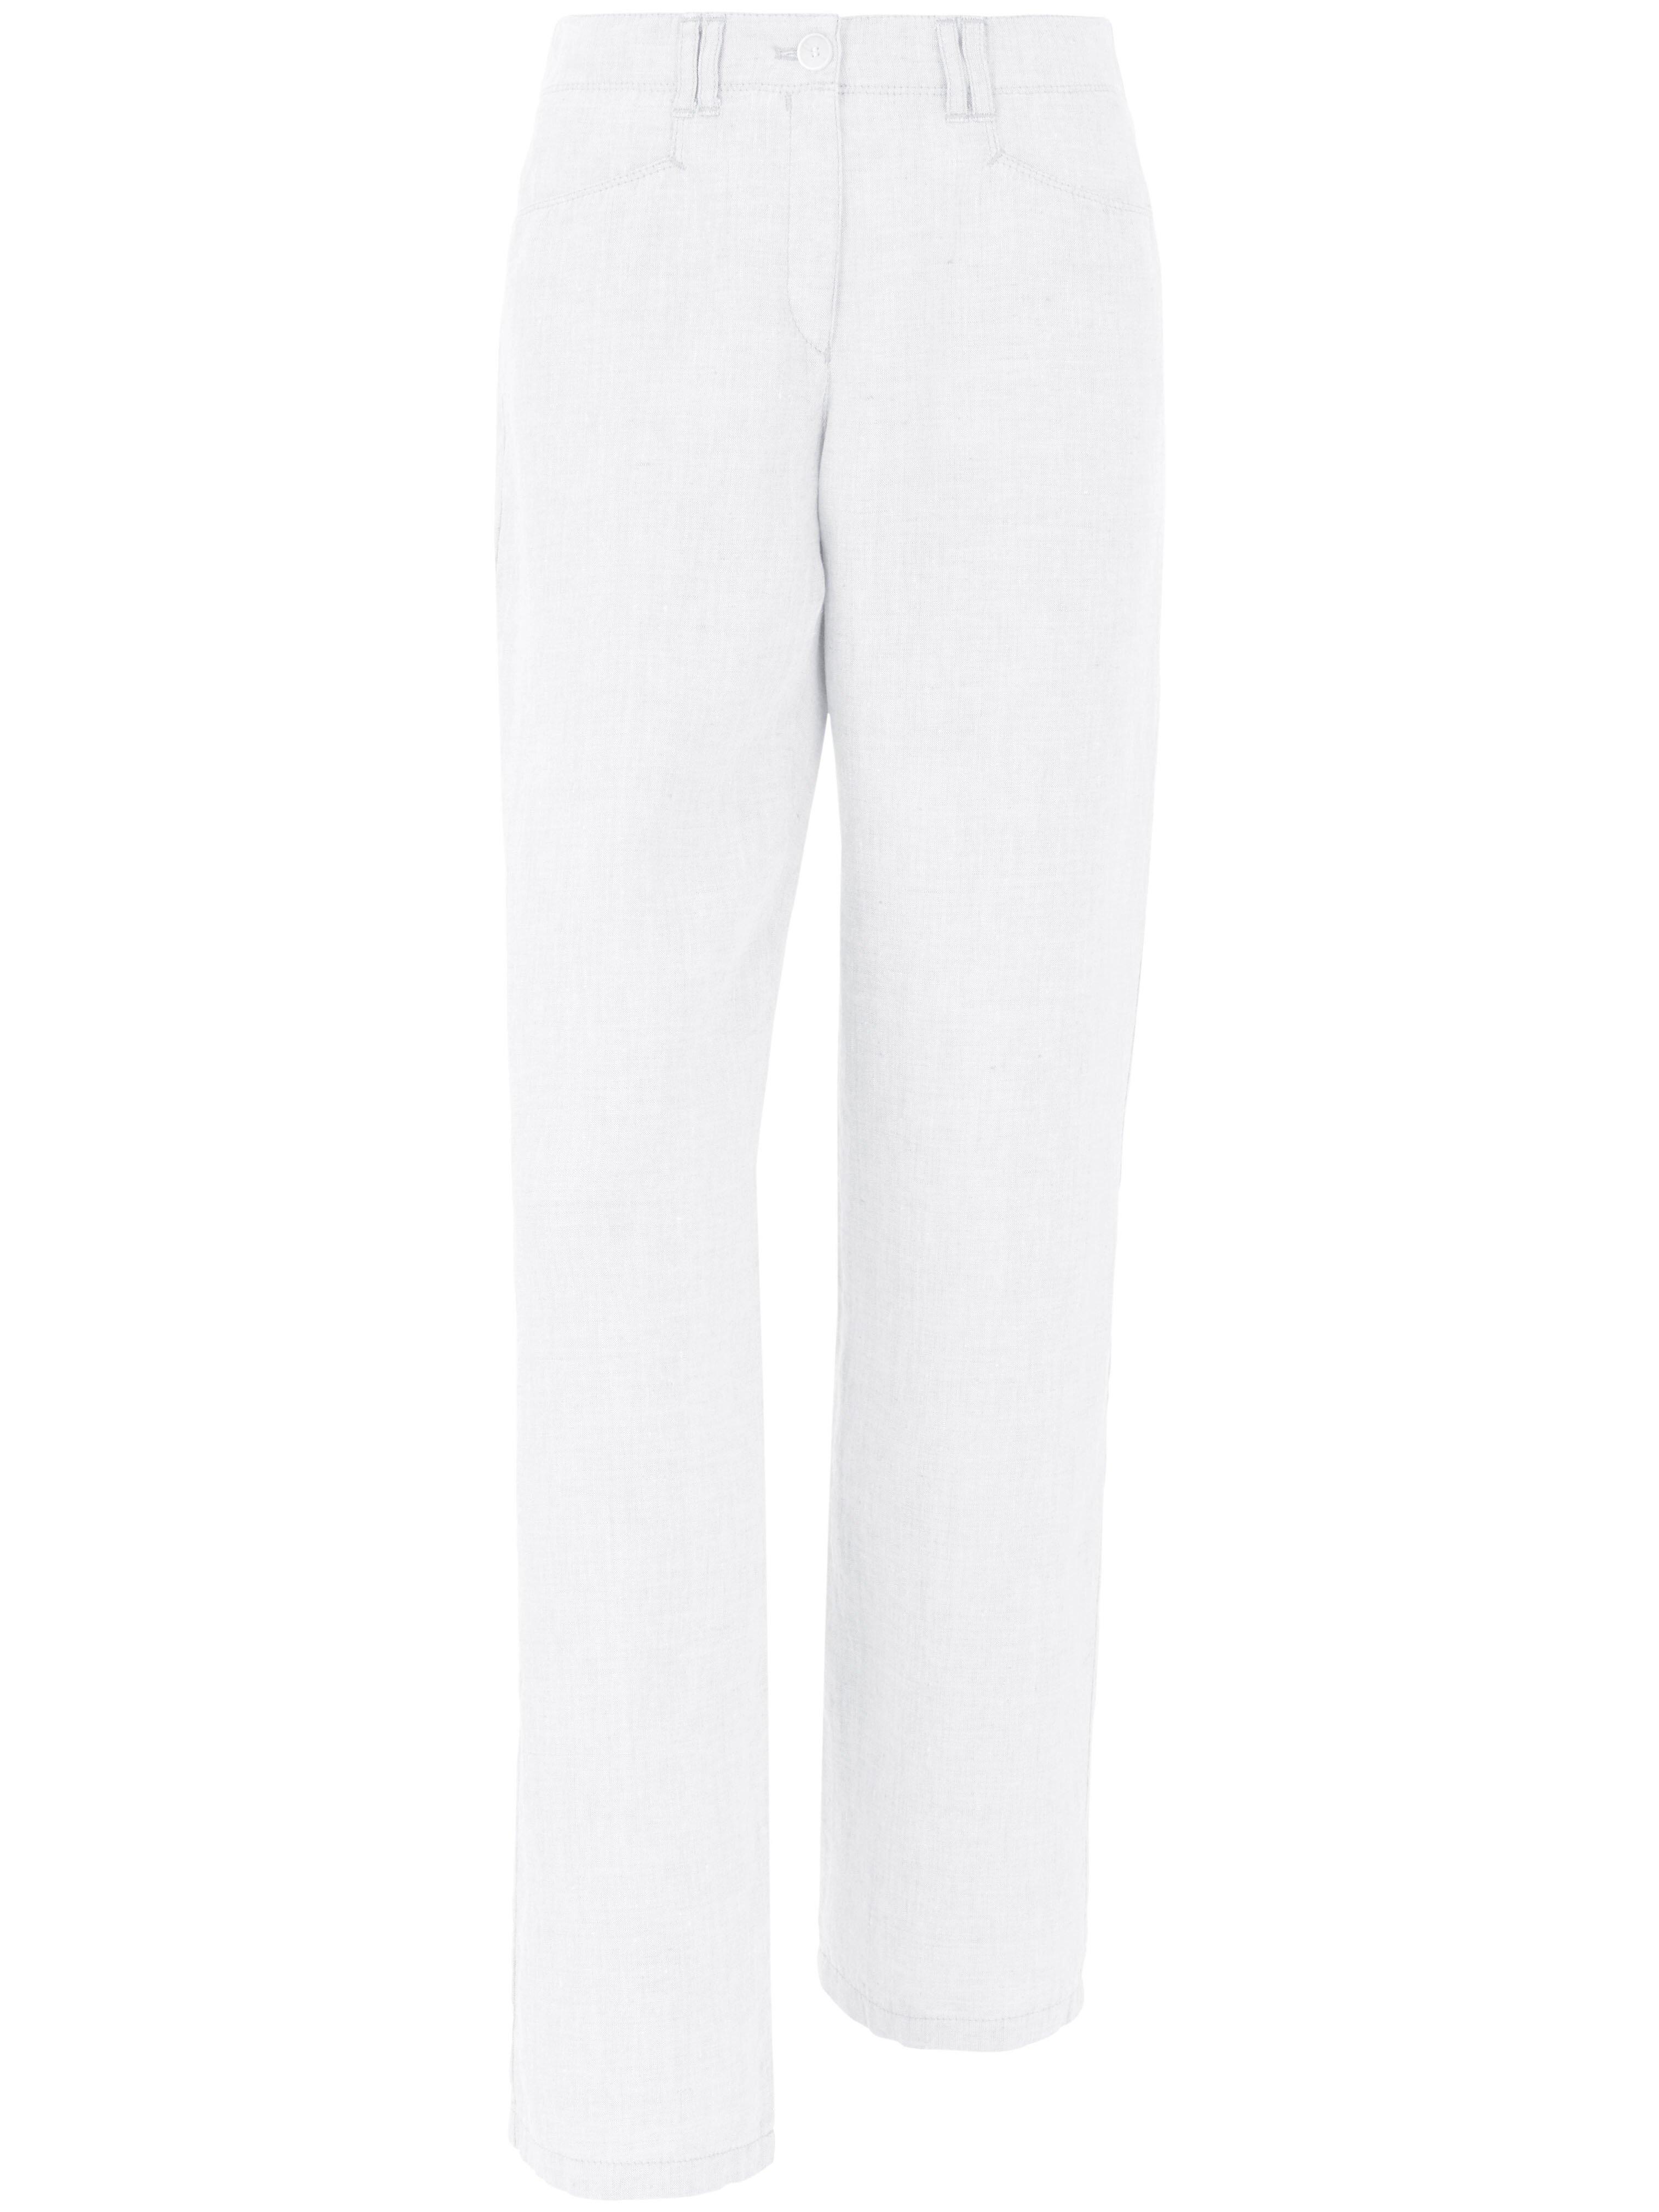 Damen Hose Feminine Fit Modell Farina Brax Feel Good weiss | Plus Size | 04044815674298